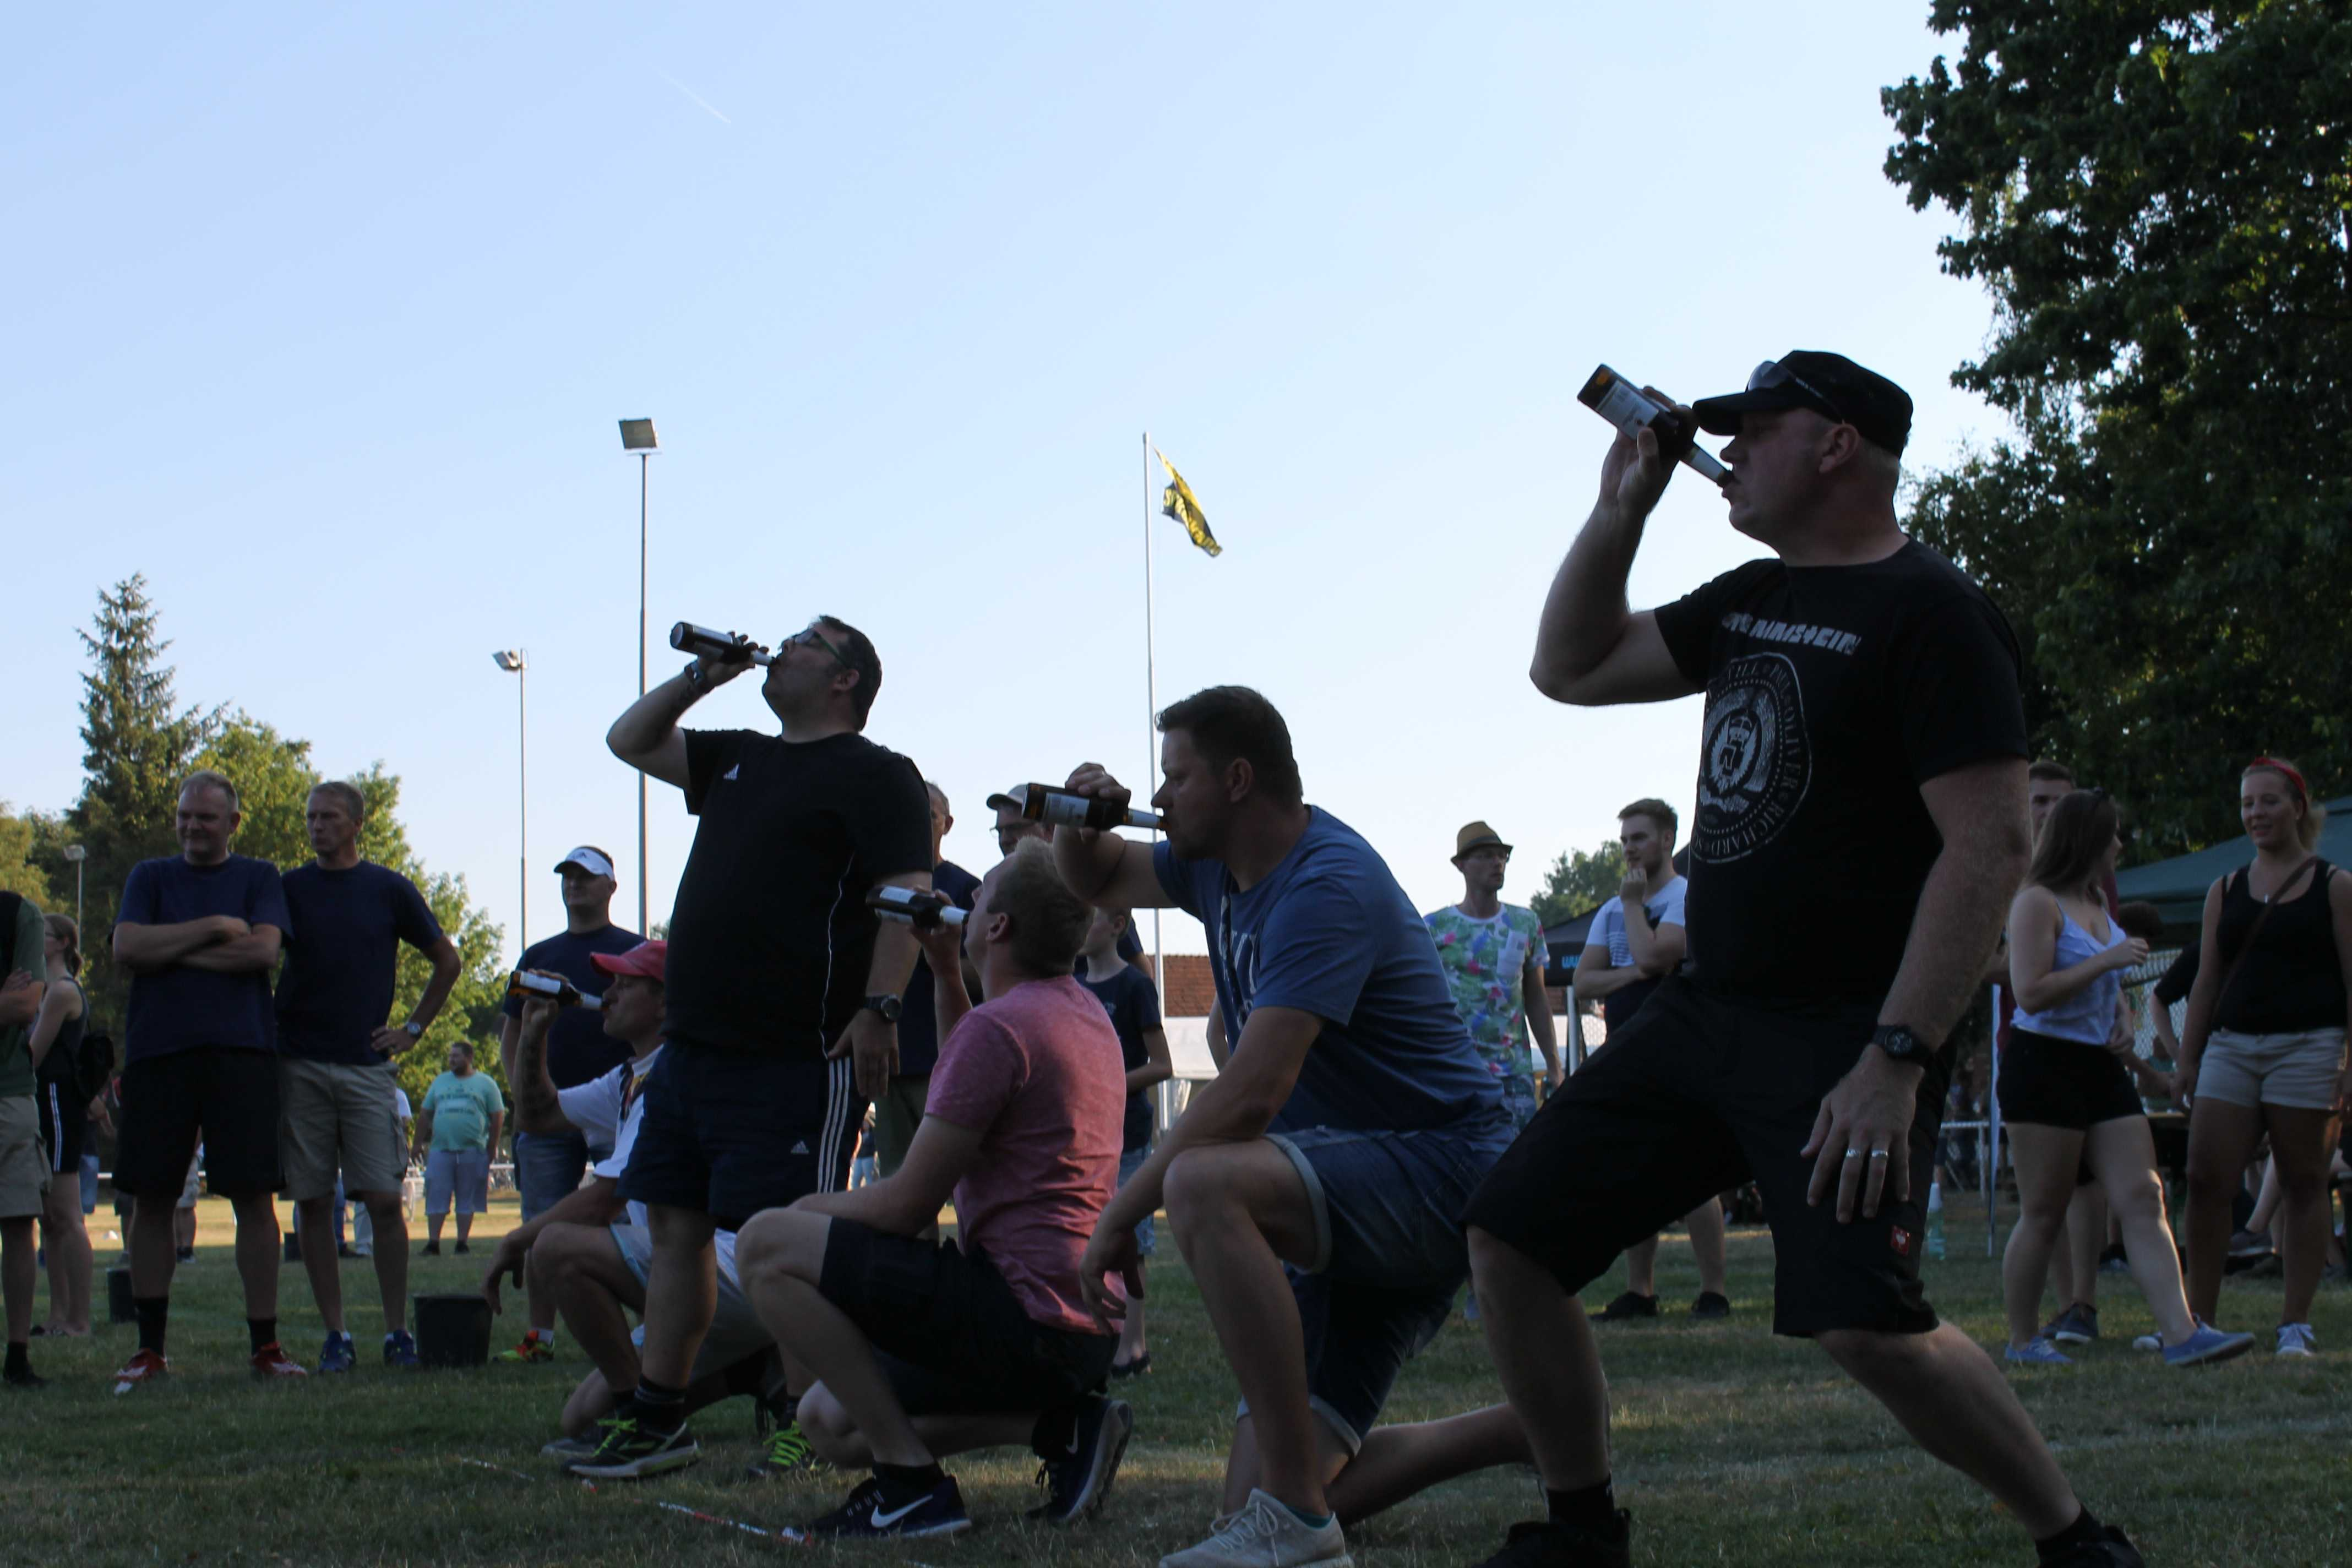 2018-07-27 Sportwoche - Flunkyball Turnier (30)